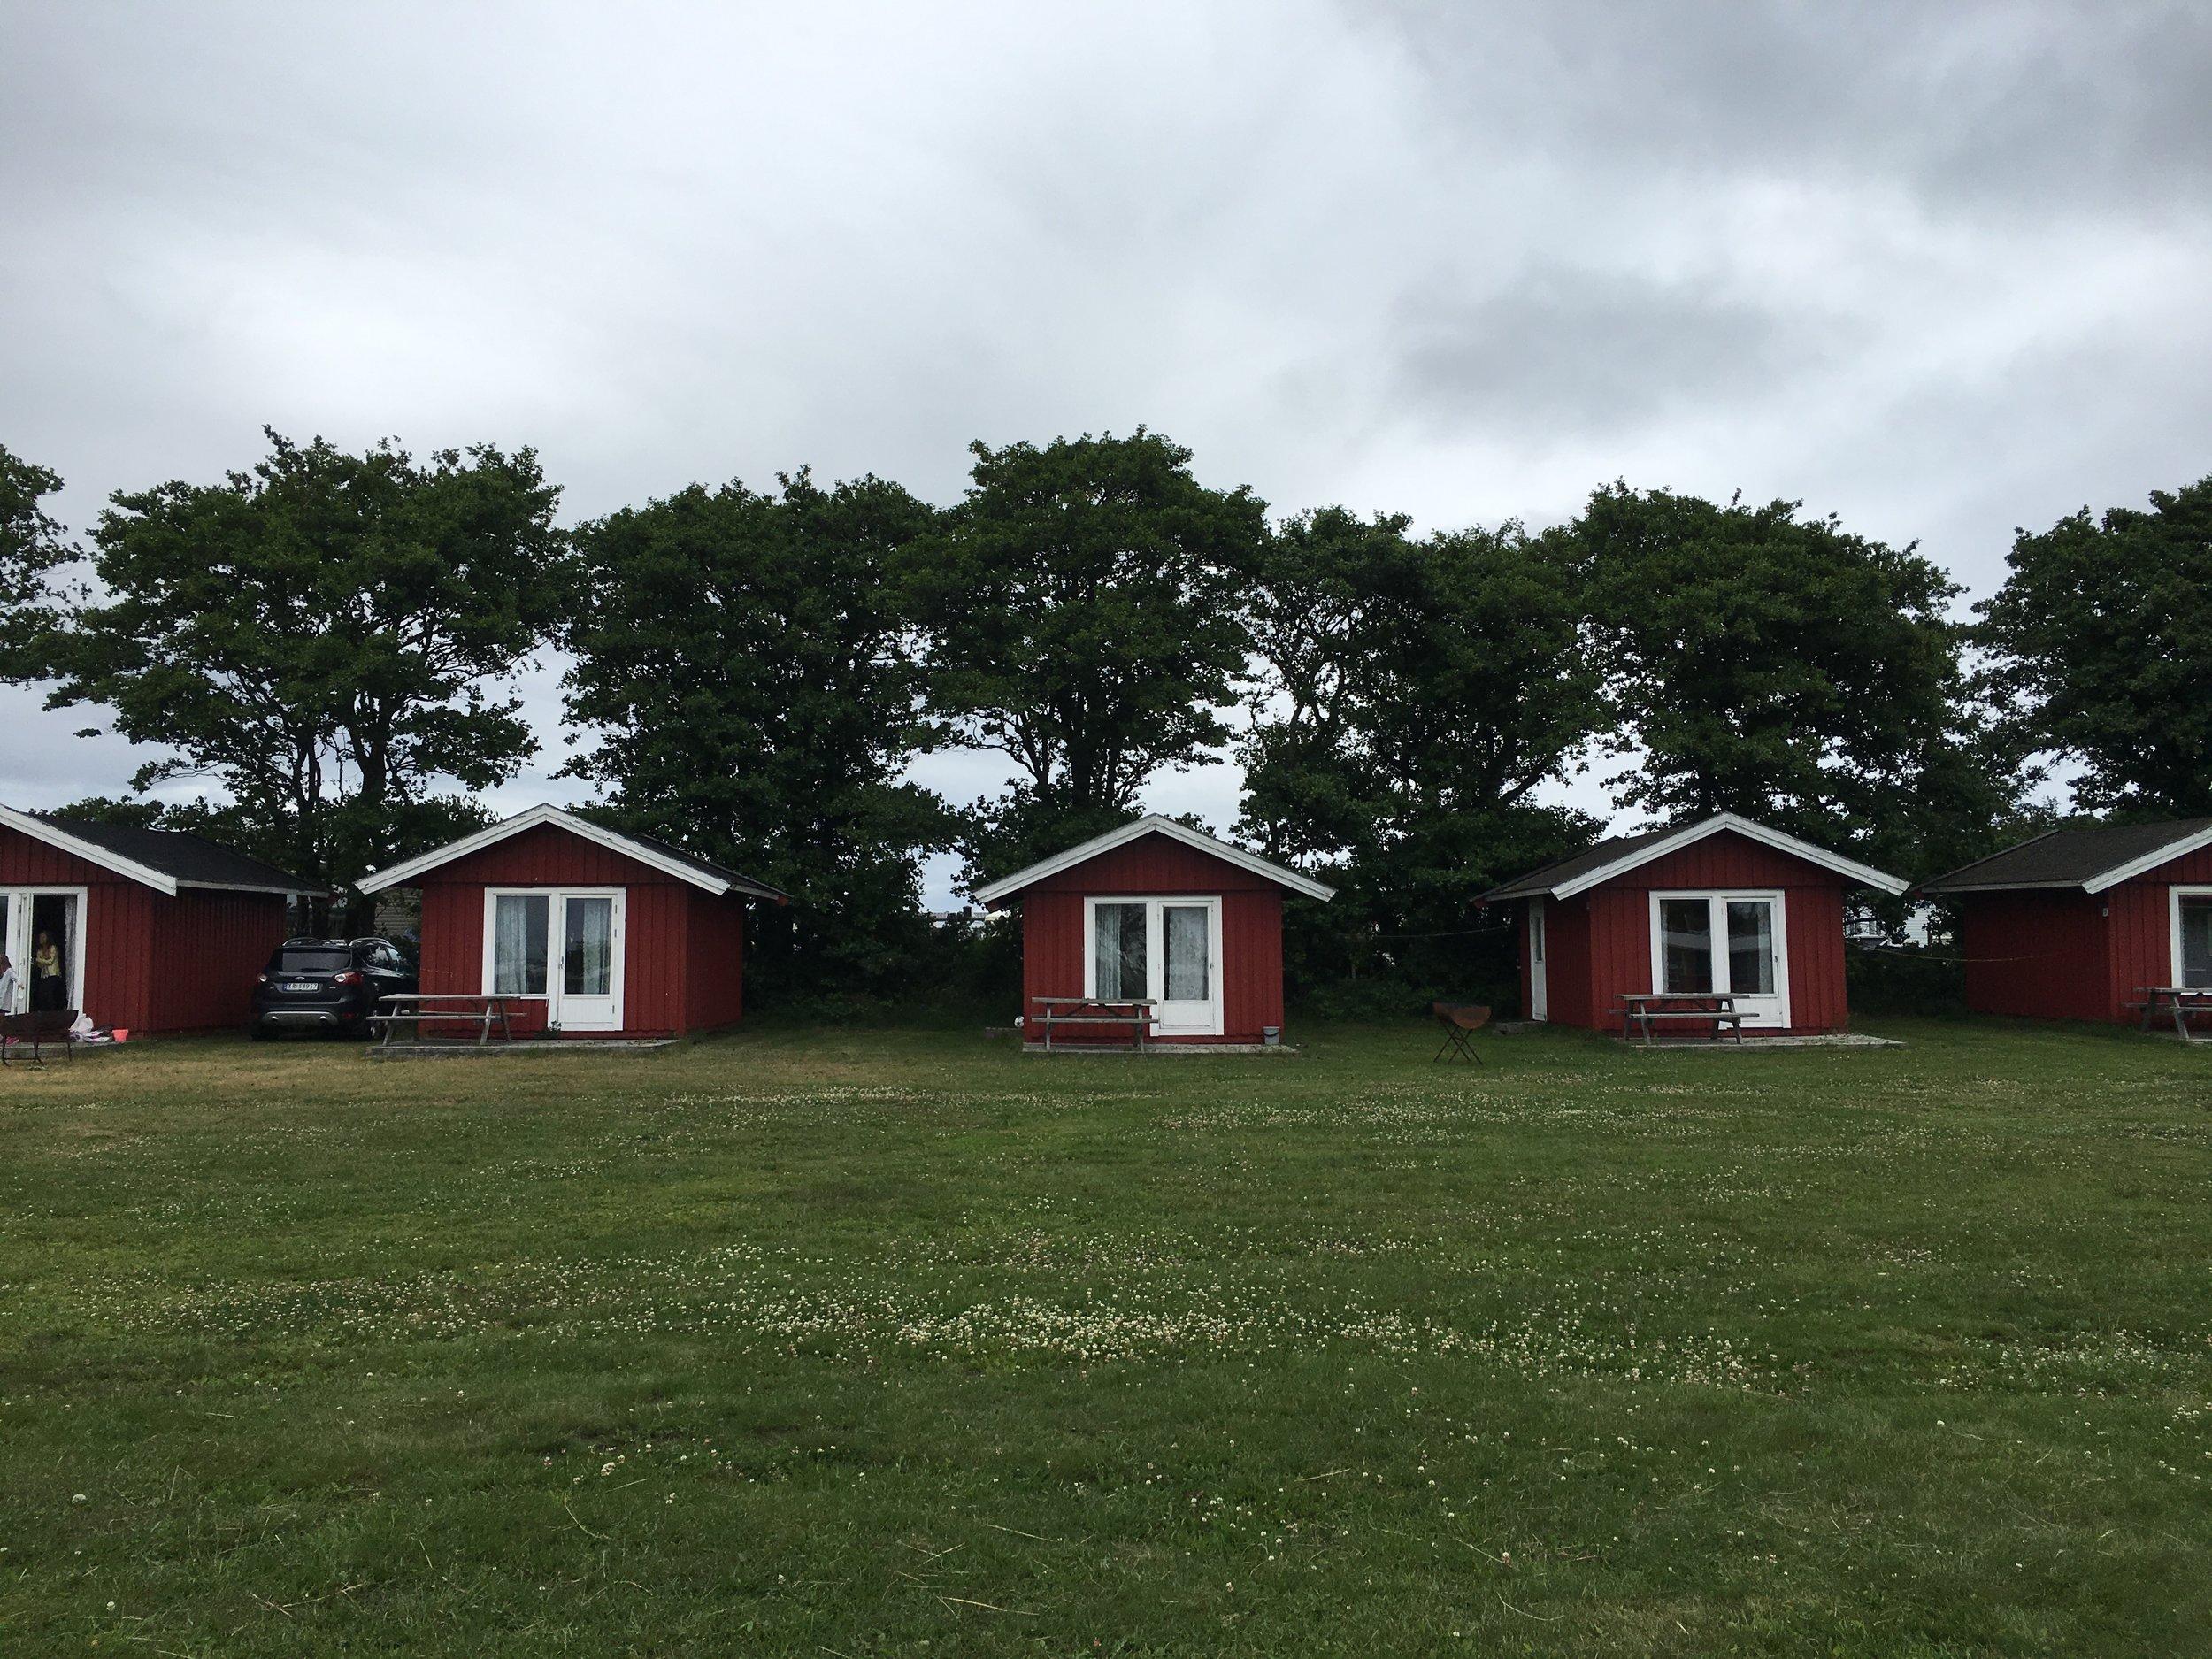 Summer Travel to Norway, Europe